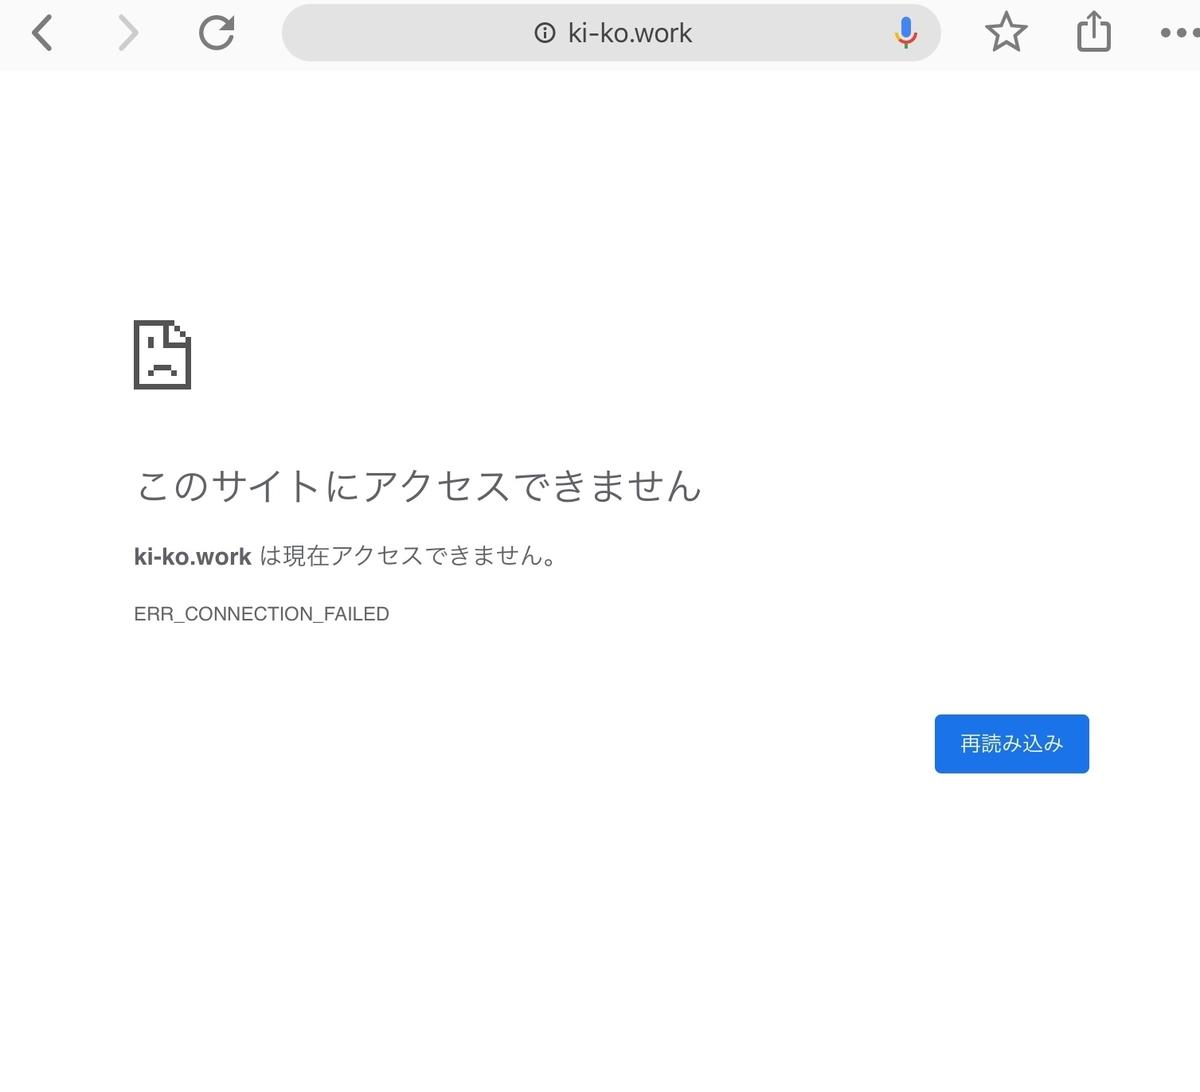 f:id:ki-kochan:20190518135806j:plain